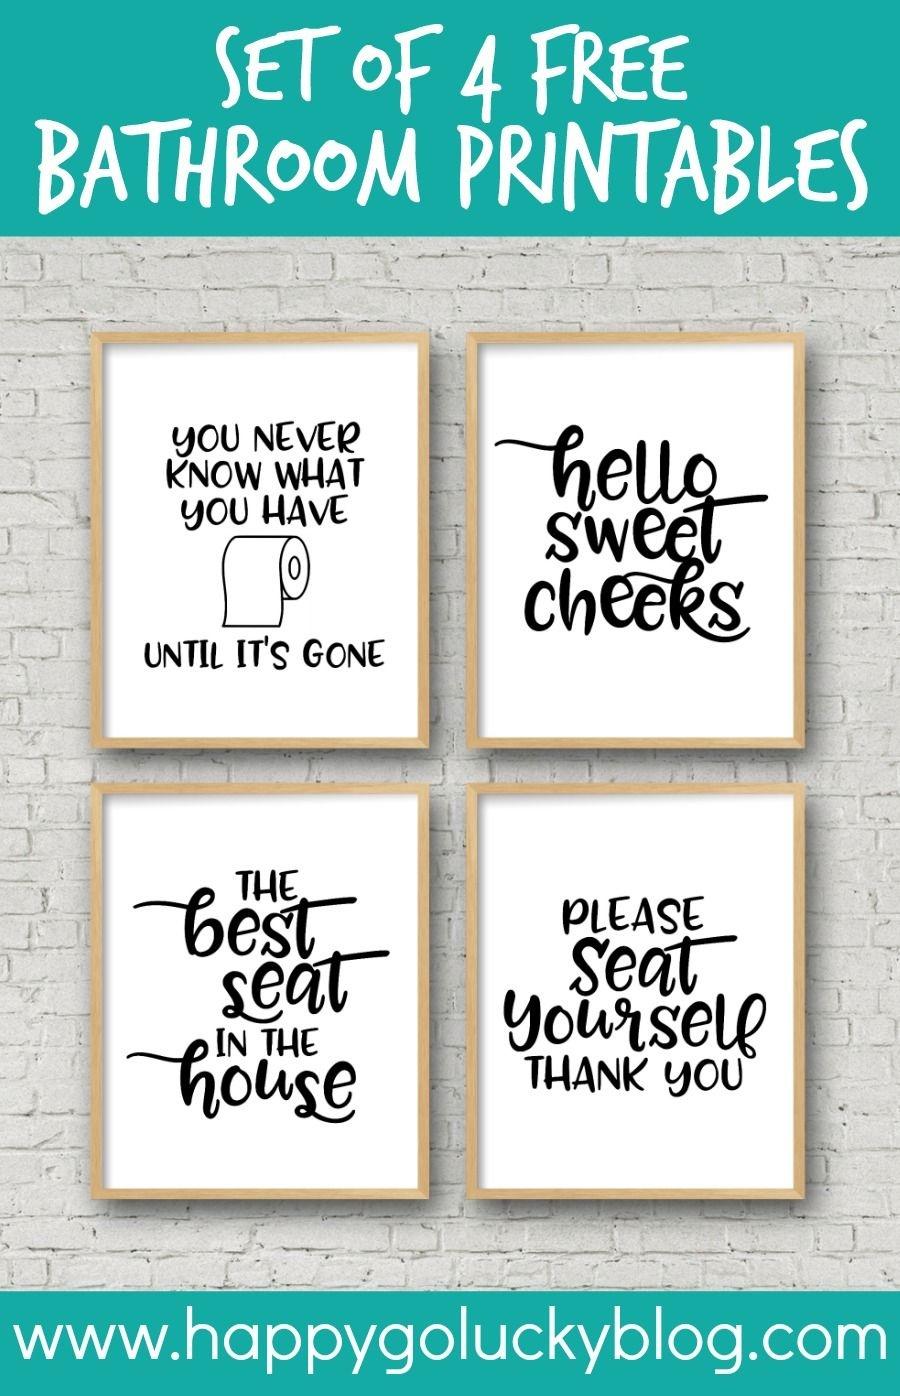 Set Of 4 Printable Bathroom Signs   Crafts-Printables   Funny - Free Printable Bathroom Signs